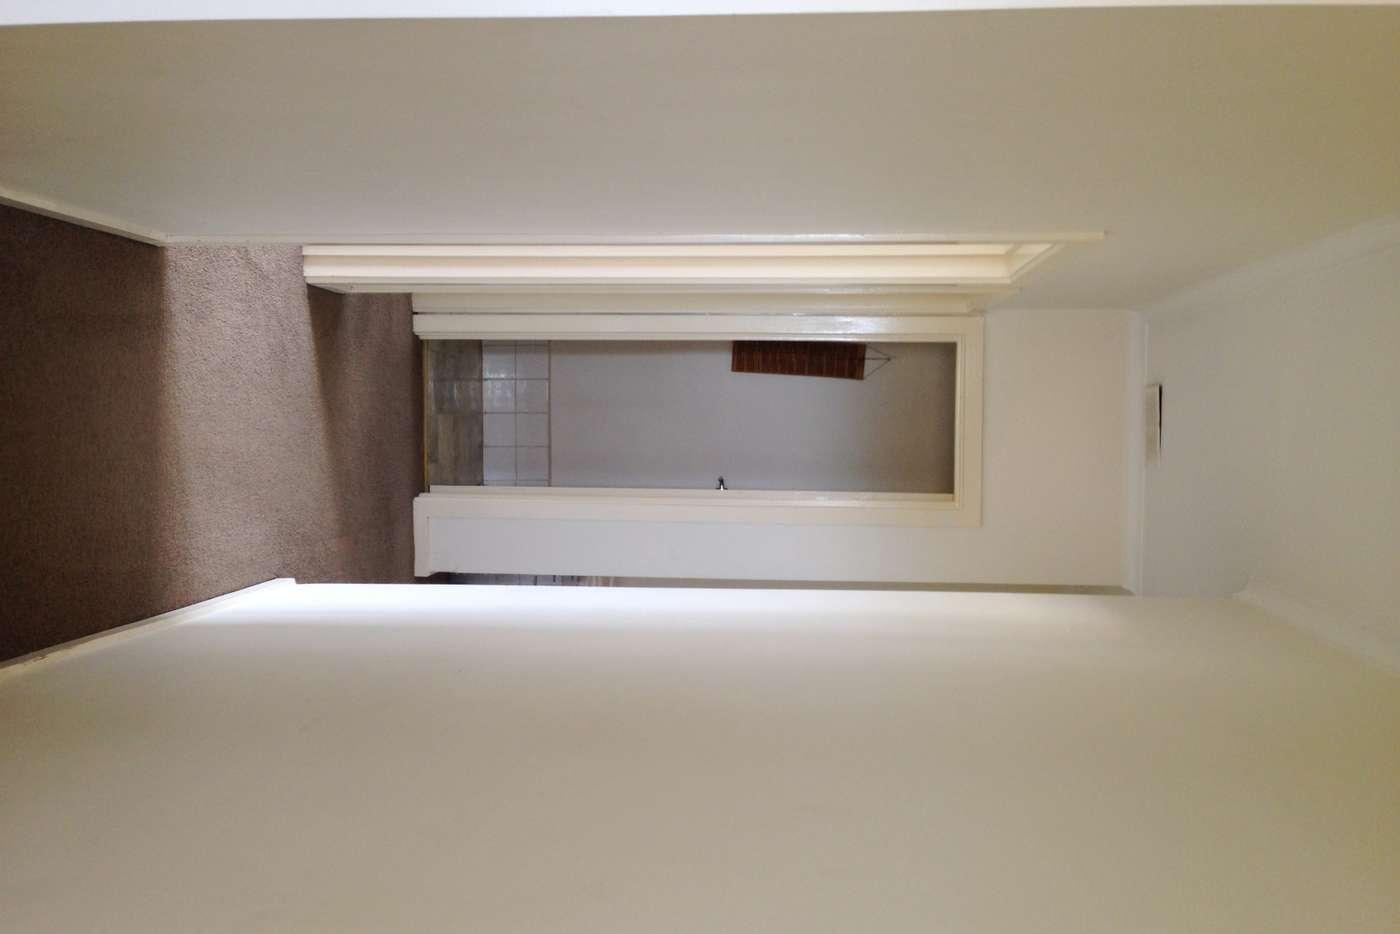 Sixth view of Homely apartment listing, 17/31 Burnett Street, St Kilda VIC 3182